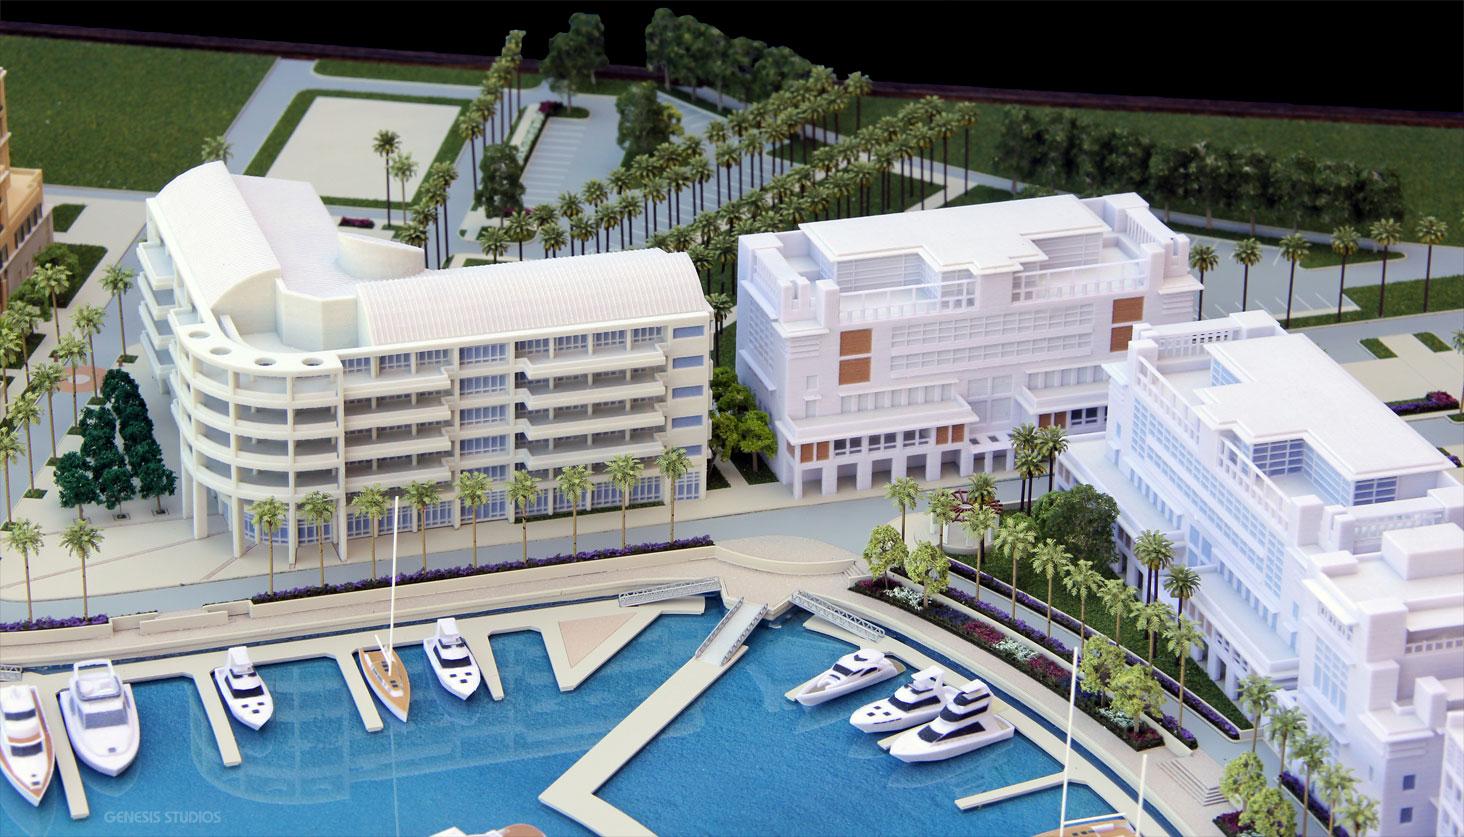 Architectural Scale Model of Albany Marina for Tavistock Development Copmany